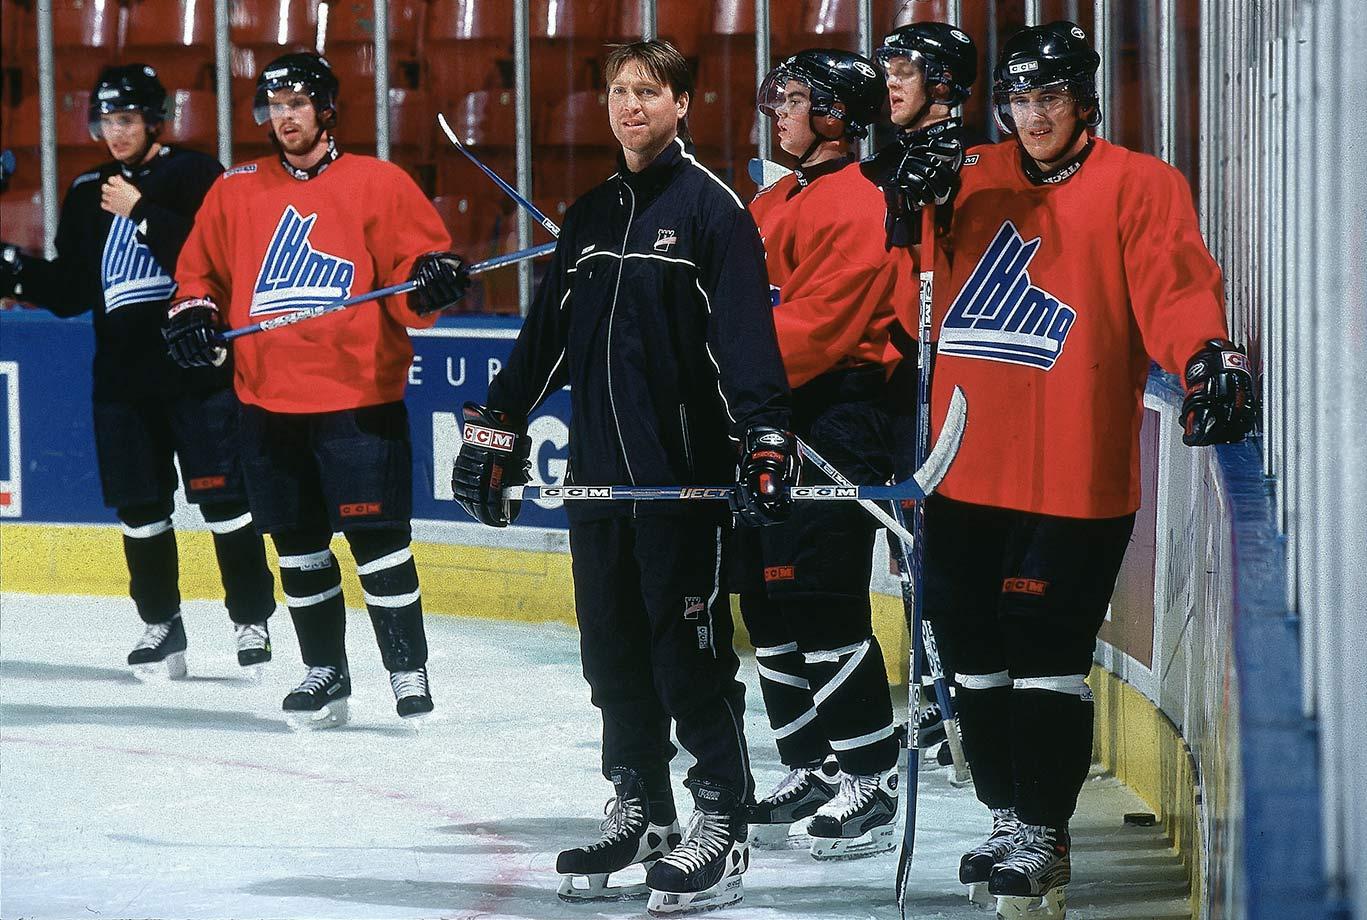 November 8, 2003 — Quebec Ramarts practice